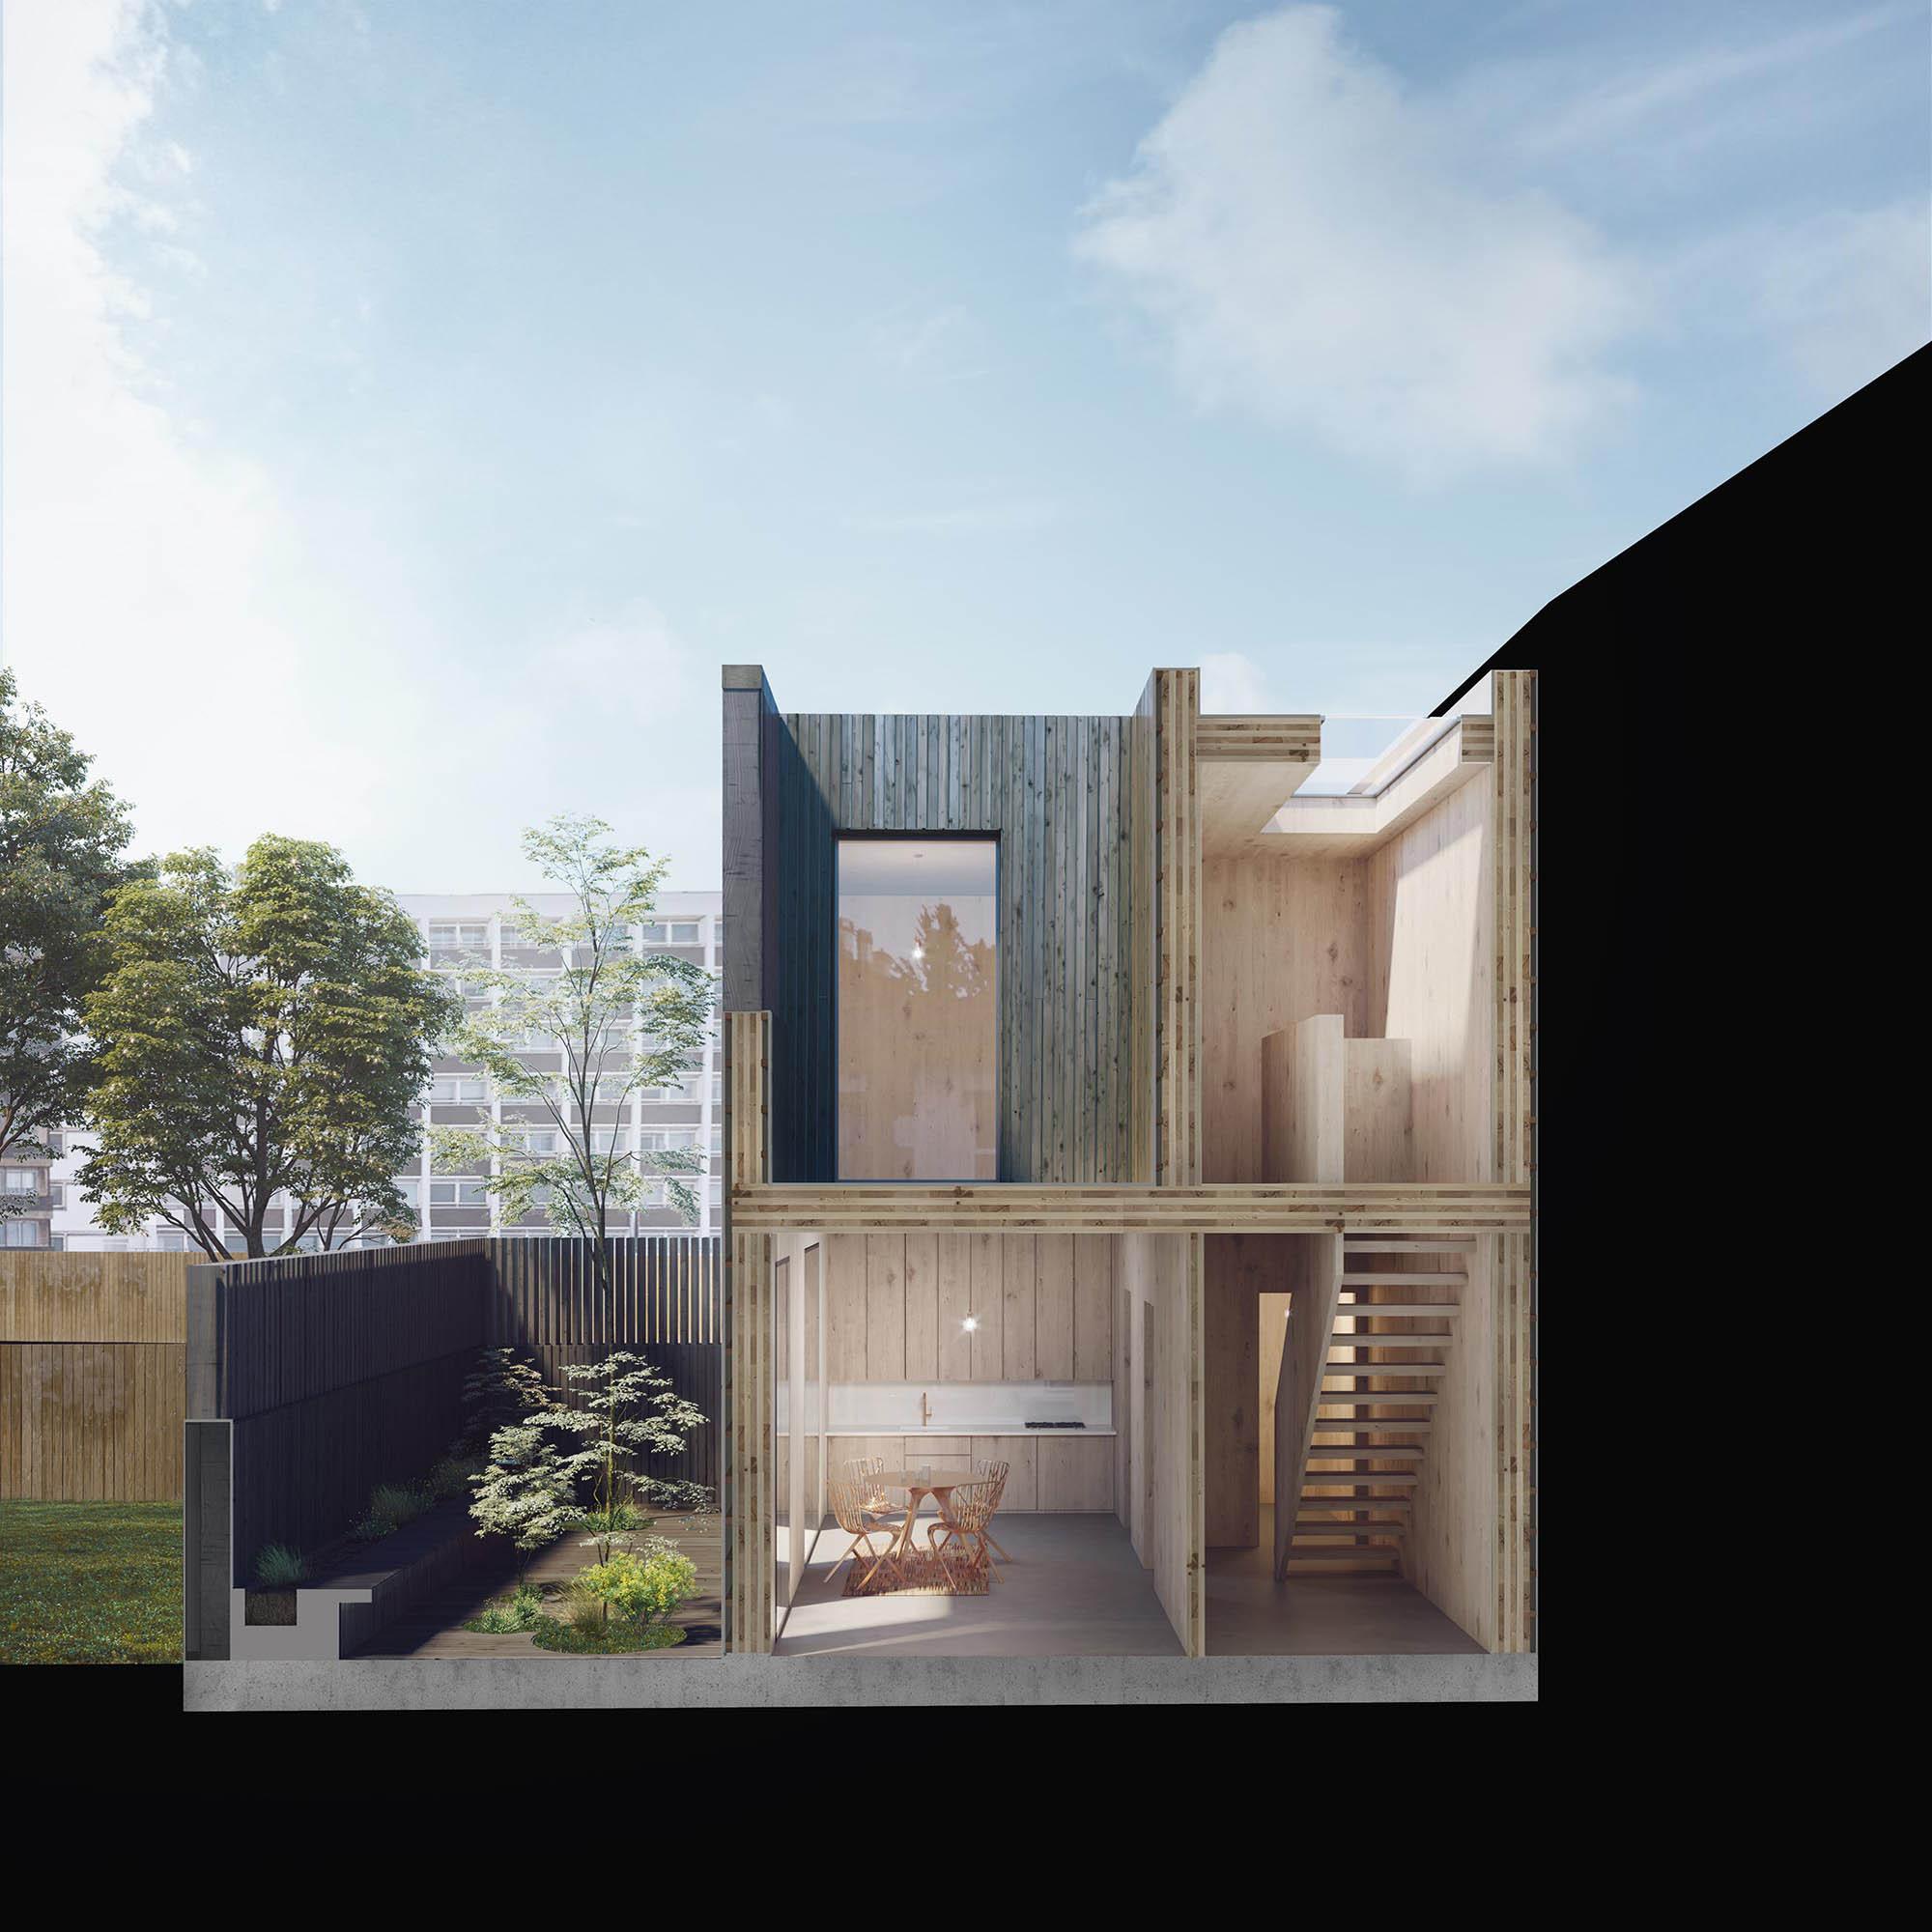 cube-haus-adjaye-associates-architects-cs-2000px-04